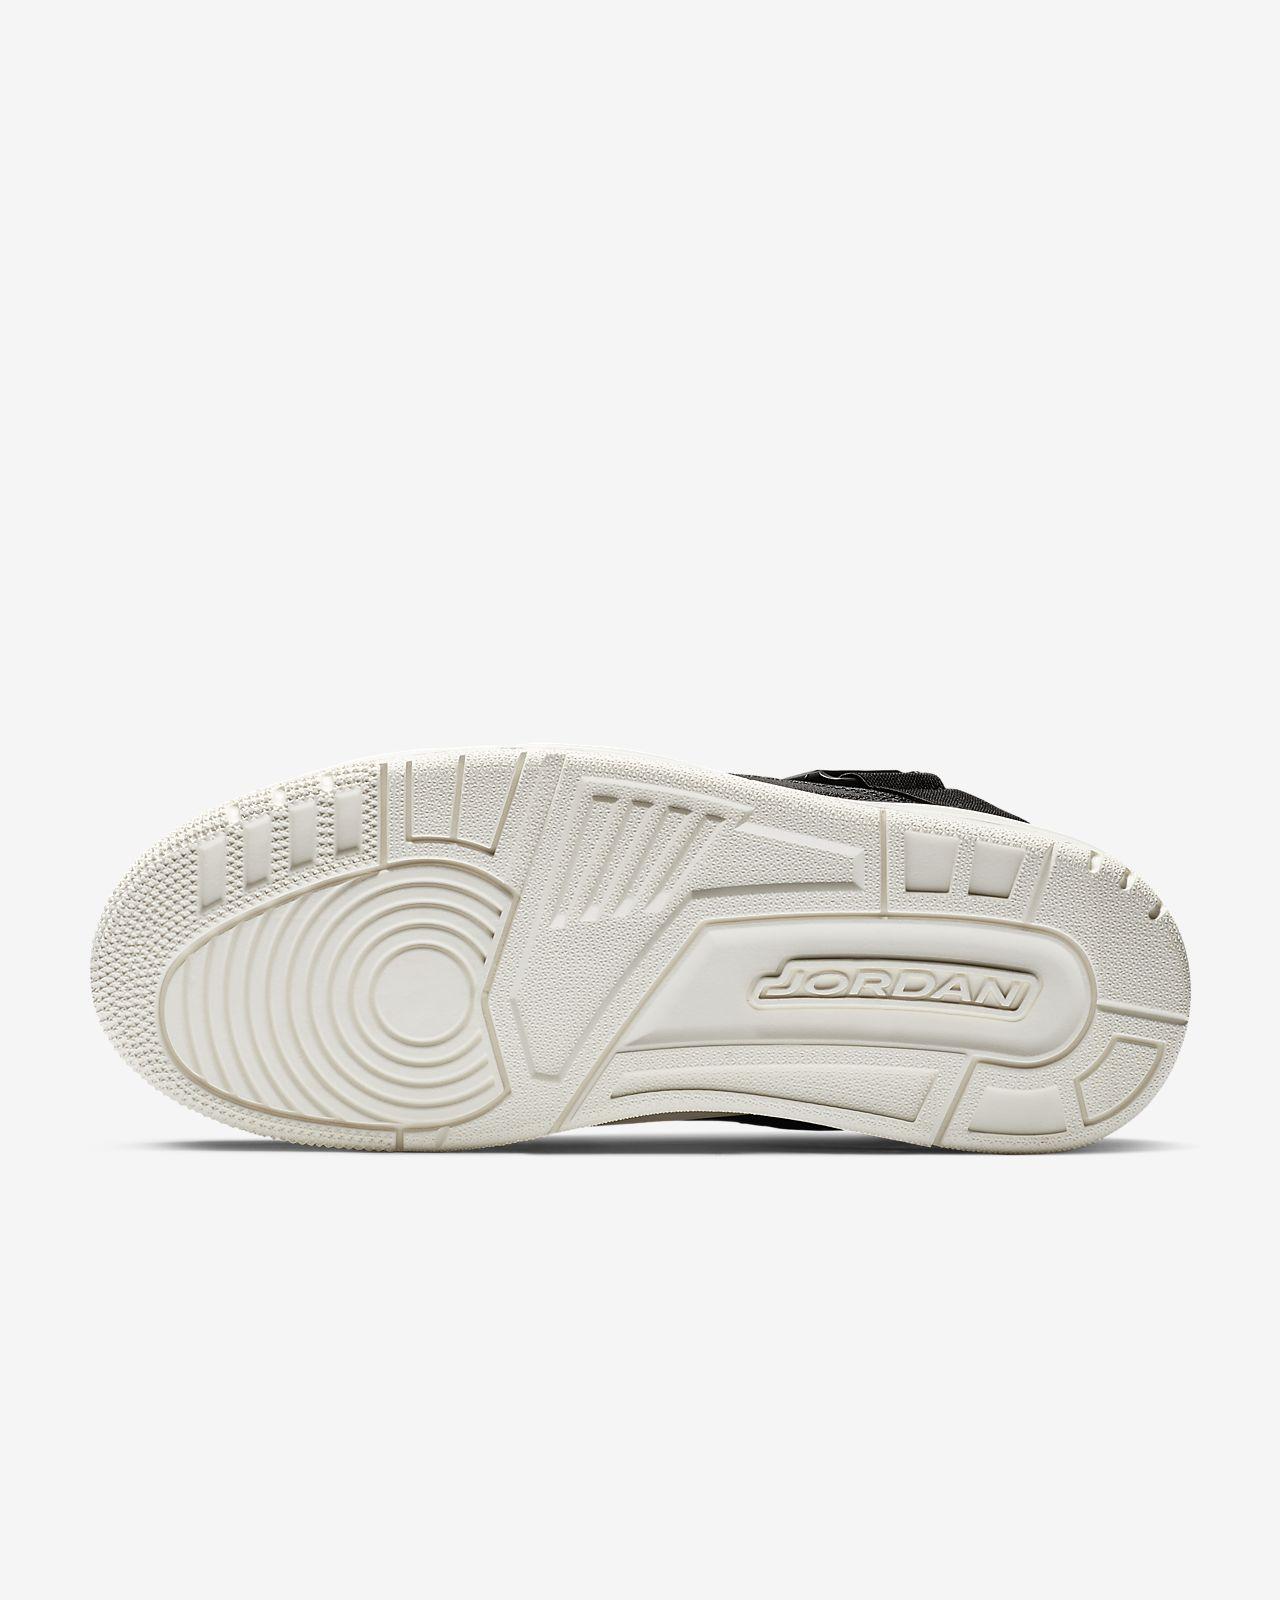 98ecf777cc6d Air Jordan 3 Retro Explorer XX Women s Shoe. Nike.com